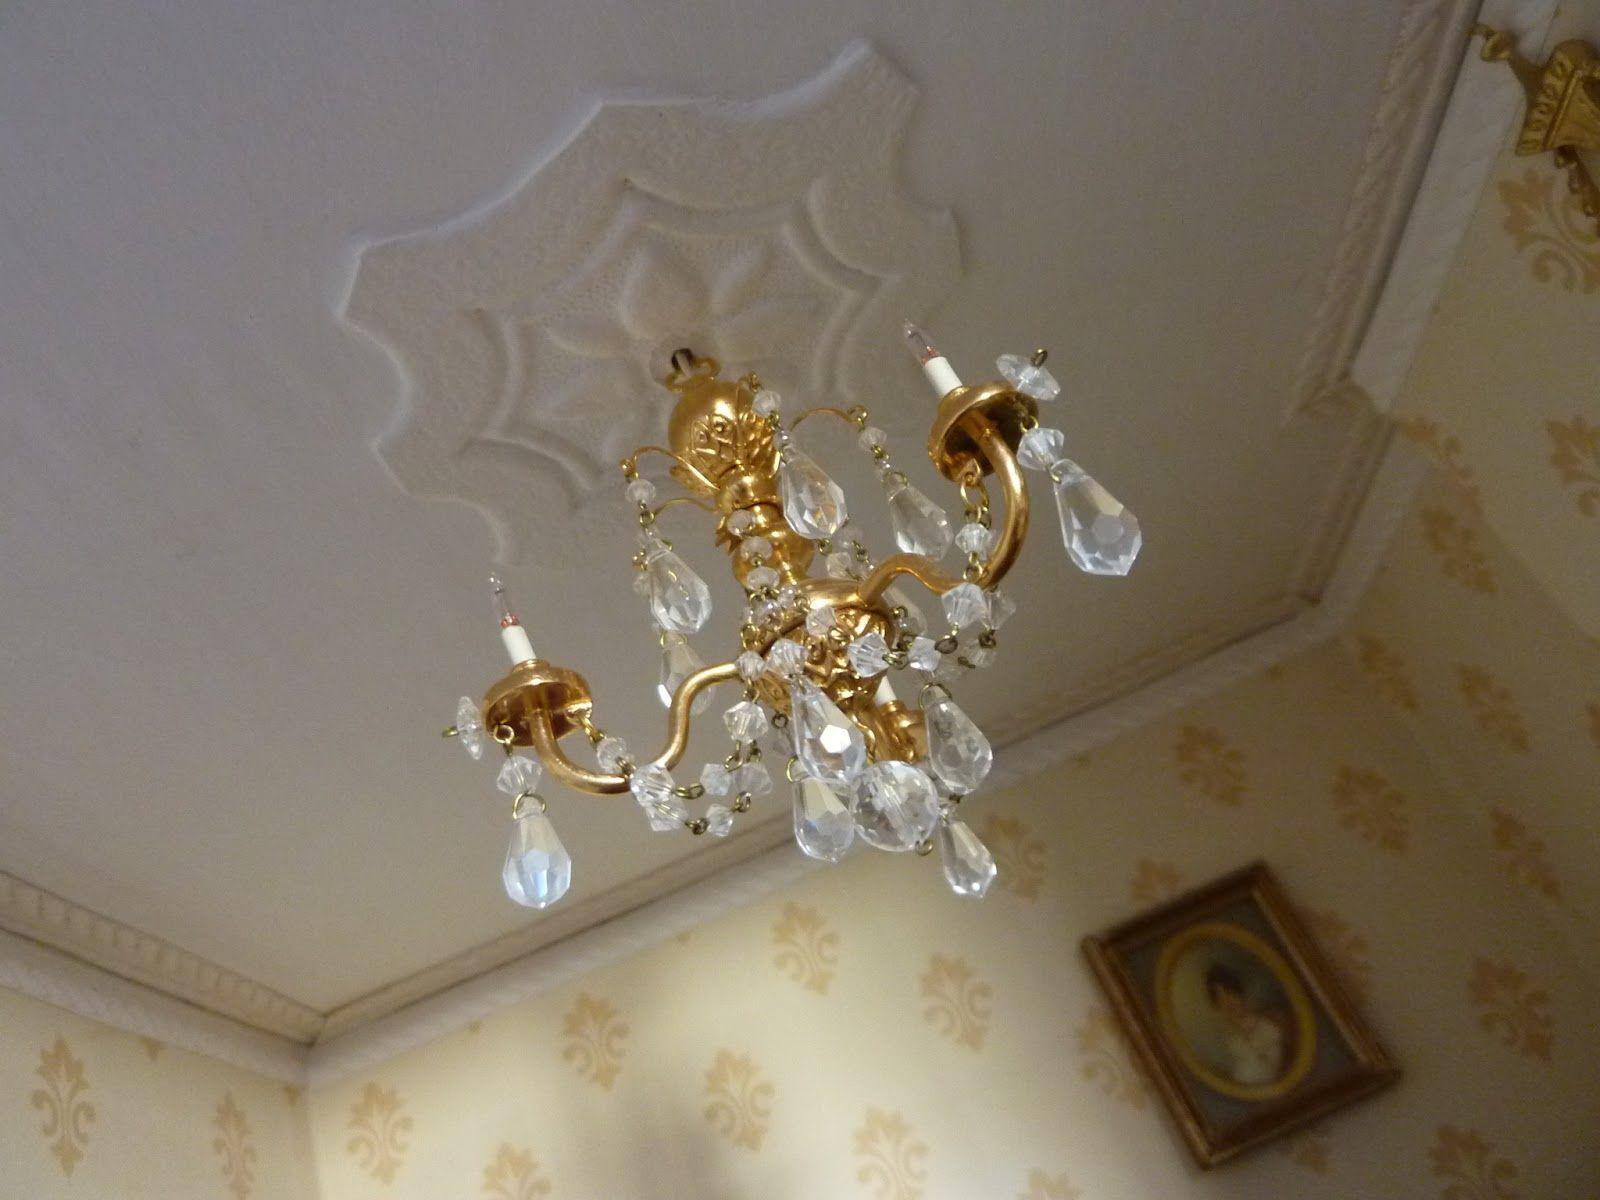 Miniature crystal ornaments - Miniature Crystal Ornaments Google Search